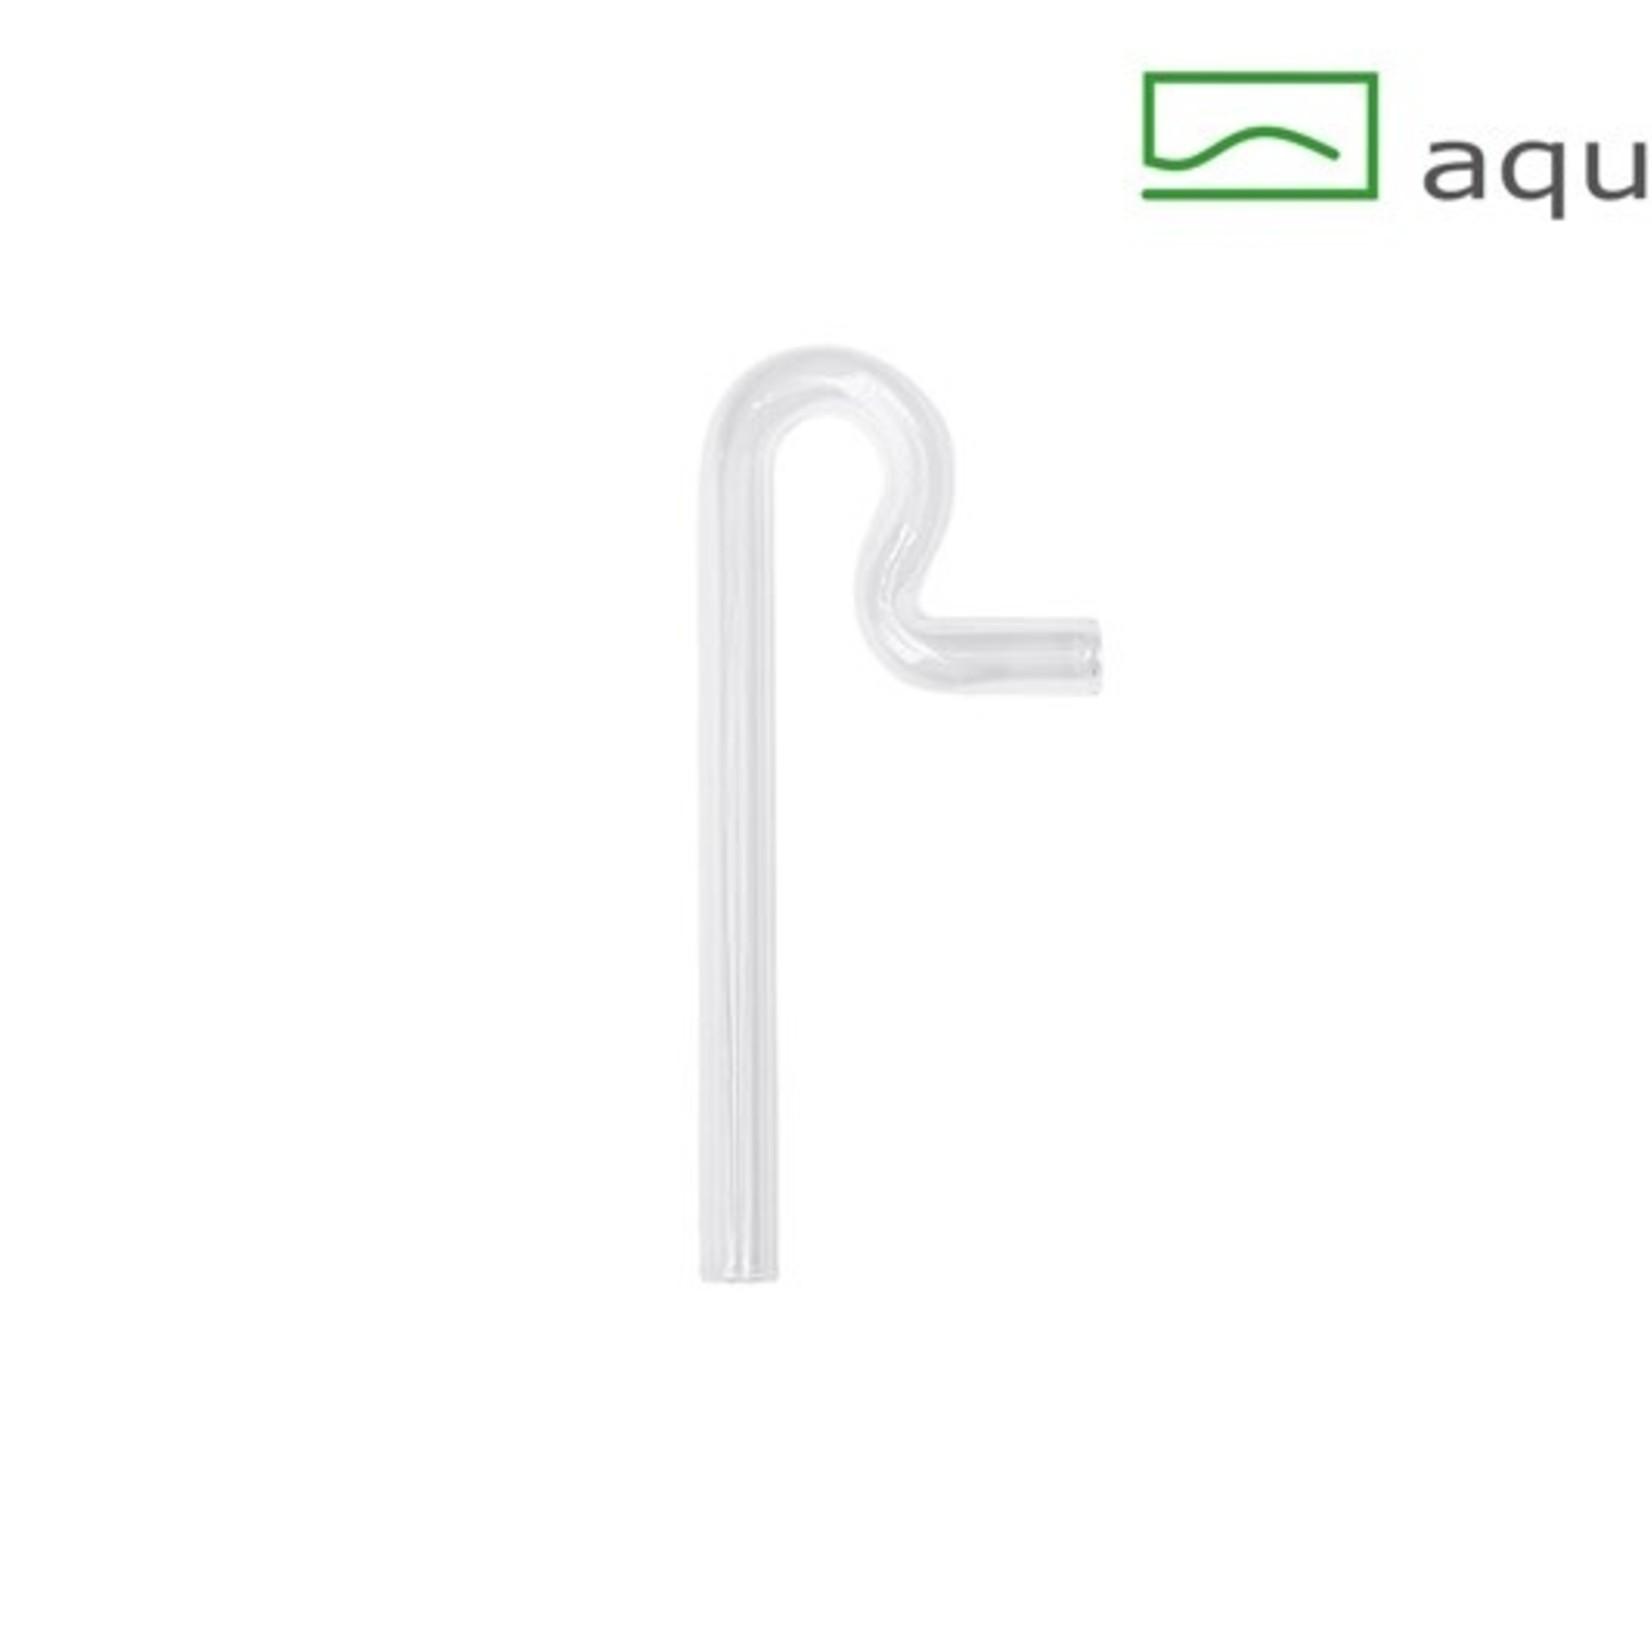 Aqua-Art Lily pijp Uitlaat 13 mm, 15 cm lang